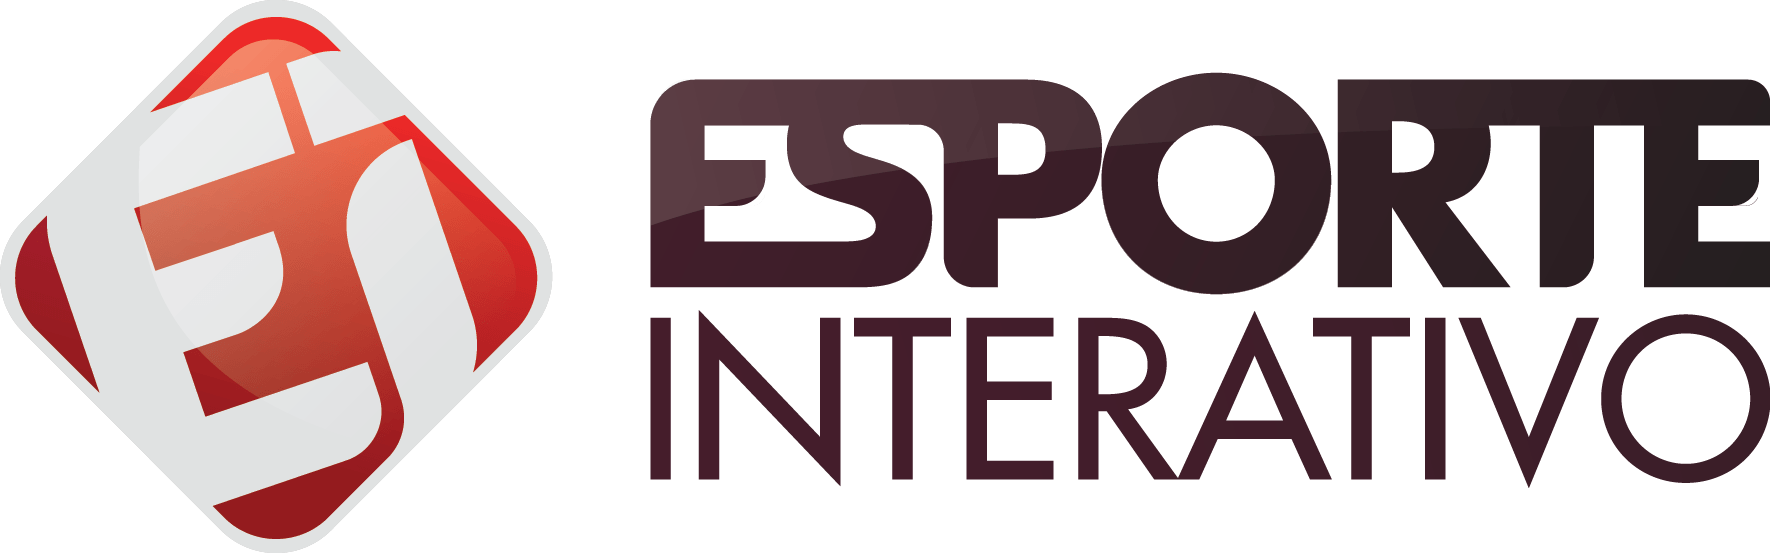 Esporte Interativo Logo photo - 1